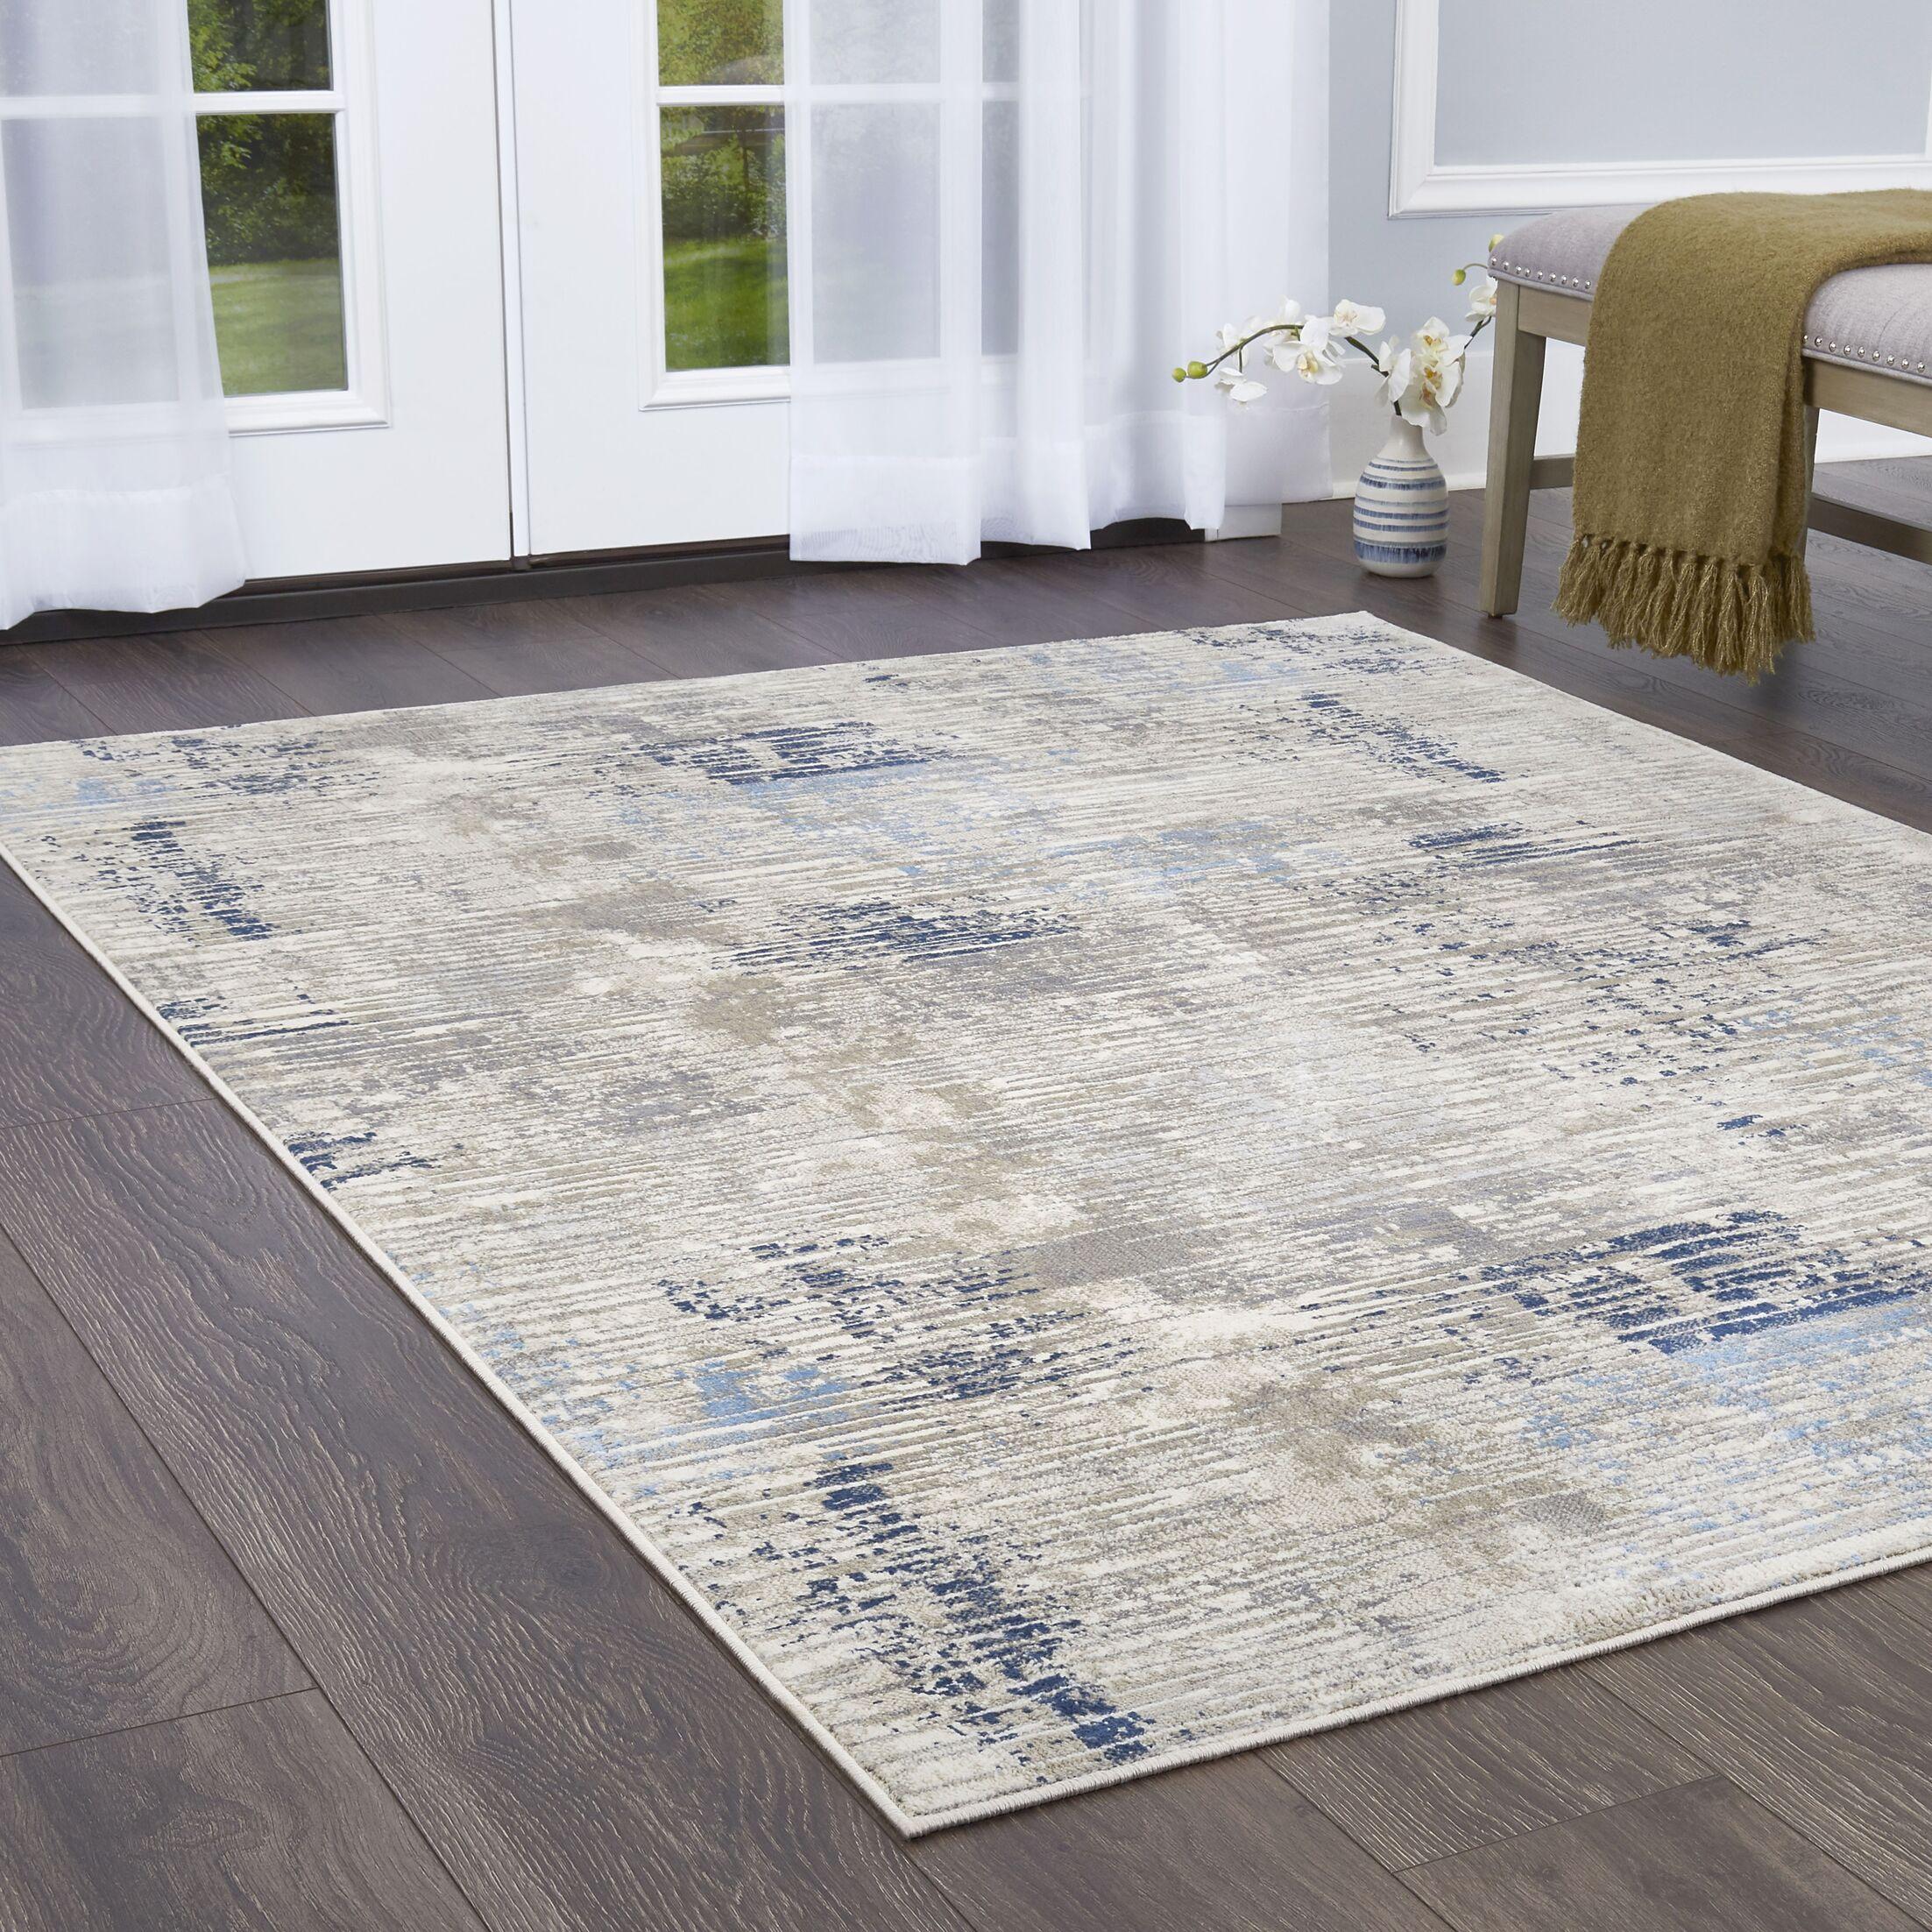 Hamm Gray/Blue Area Rug Rug Size: Rectangle 5'2